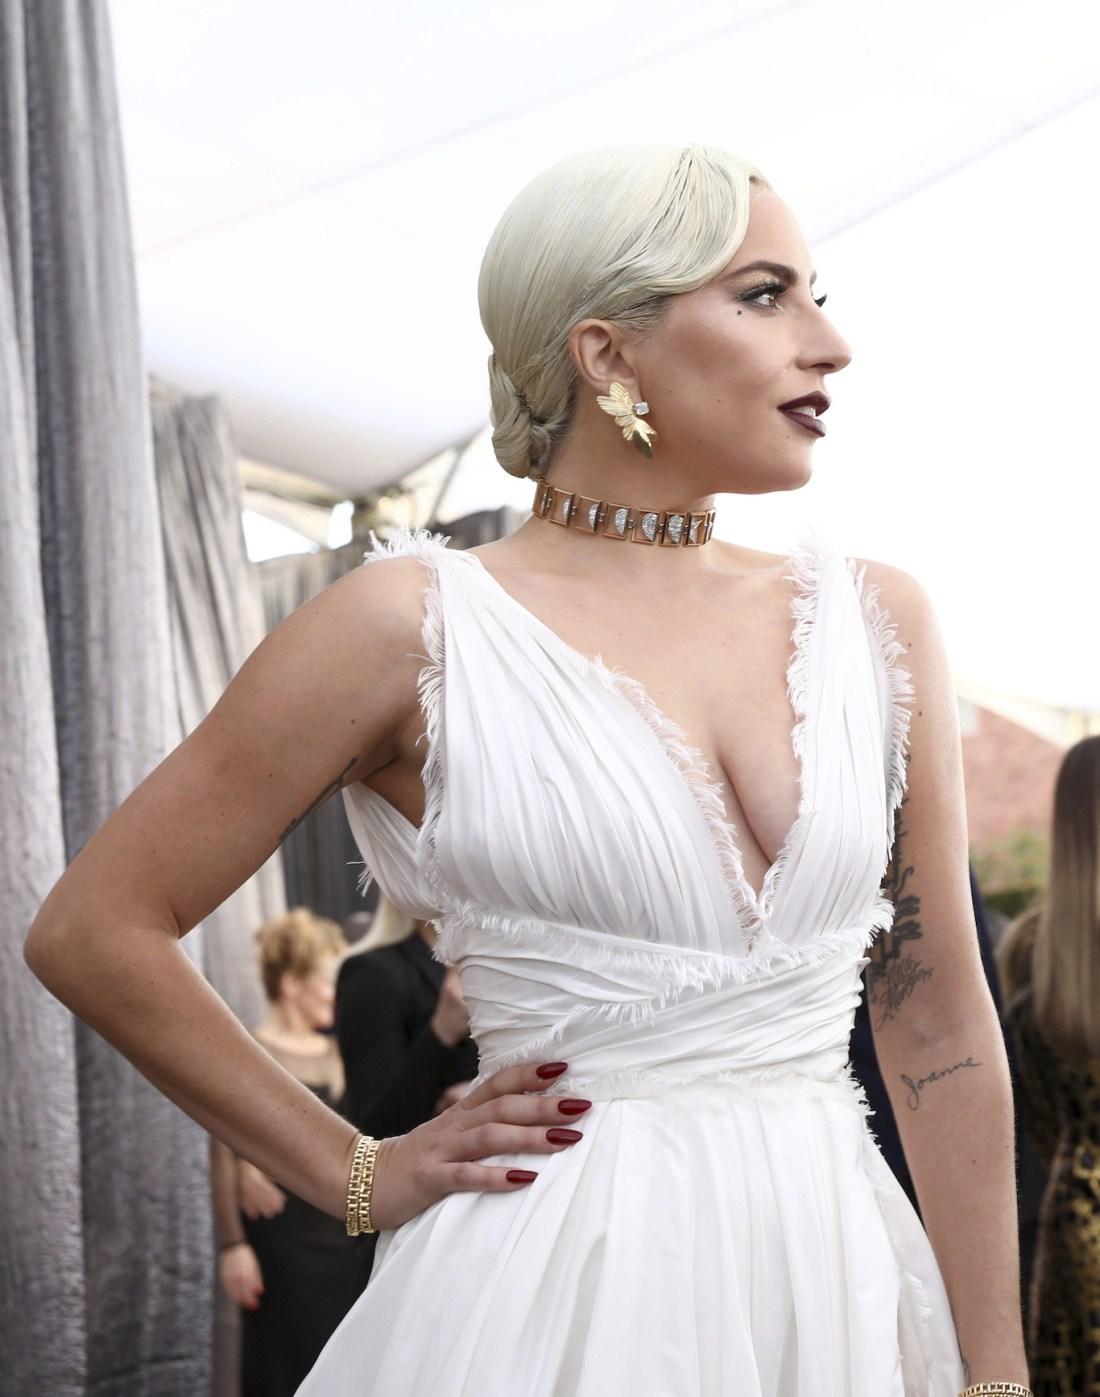 SAG Awards Lady Gaga